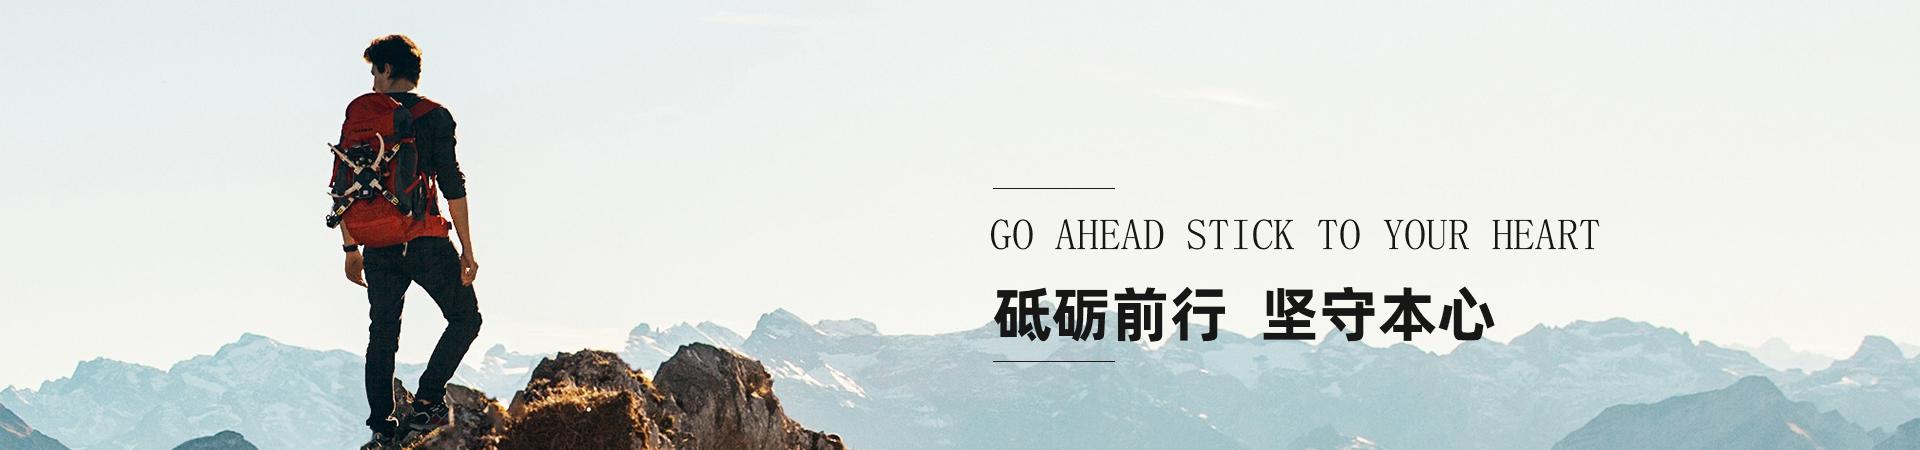 http://www.xxfuchen.com/data/upload/202007/20200725085700_537.jpg